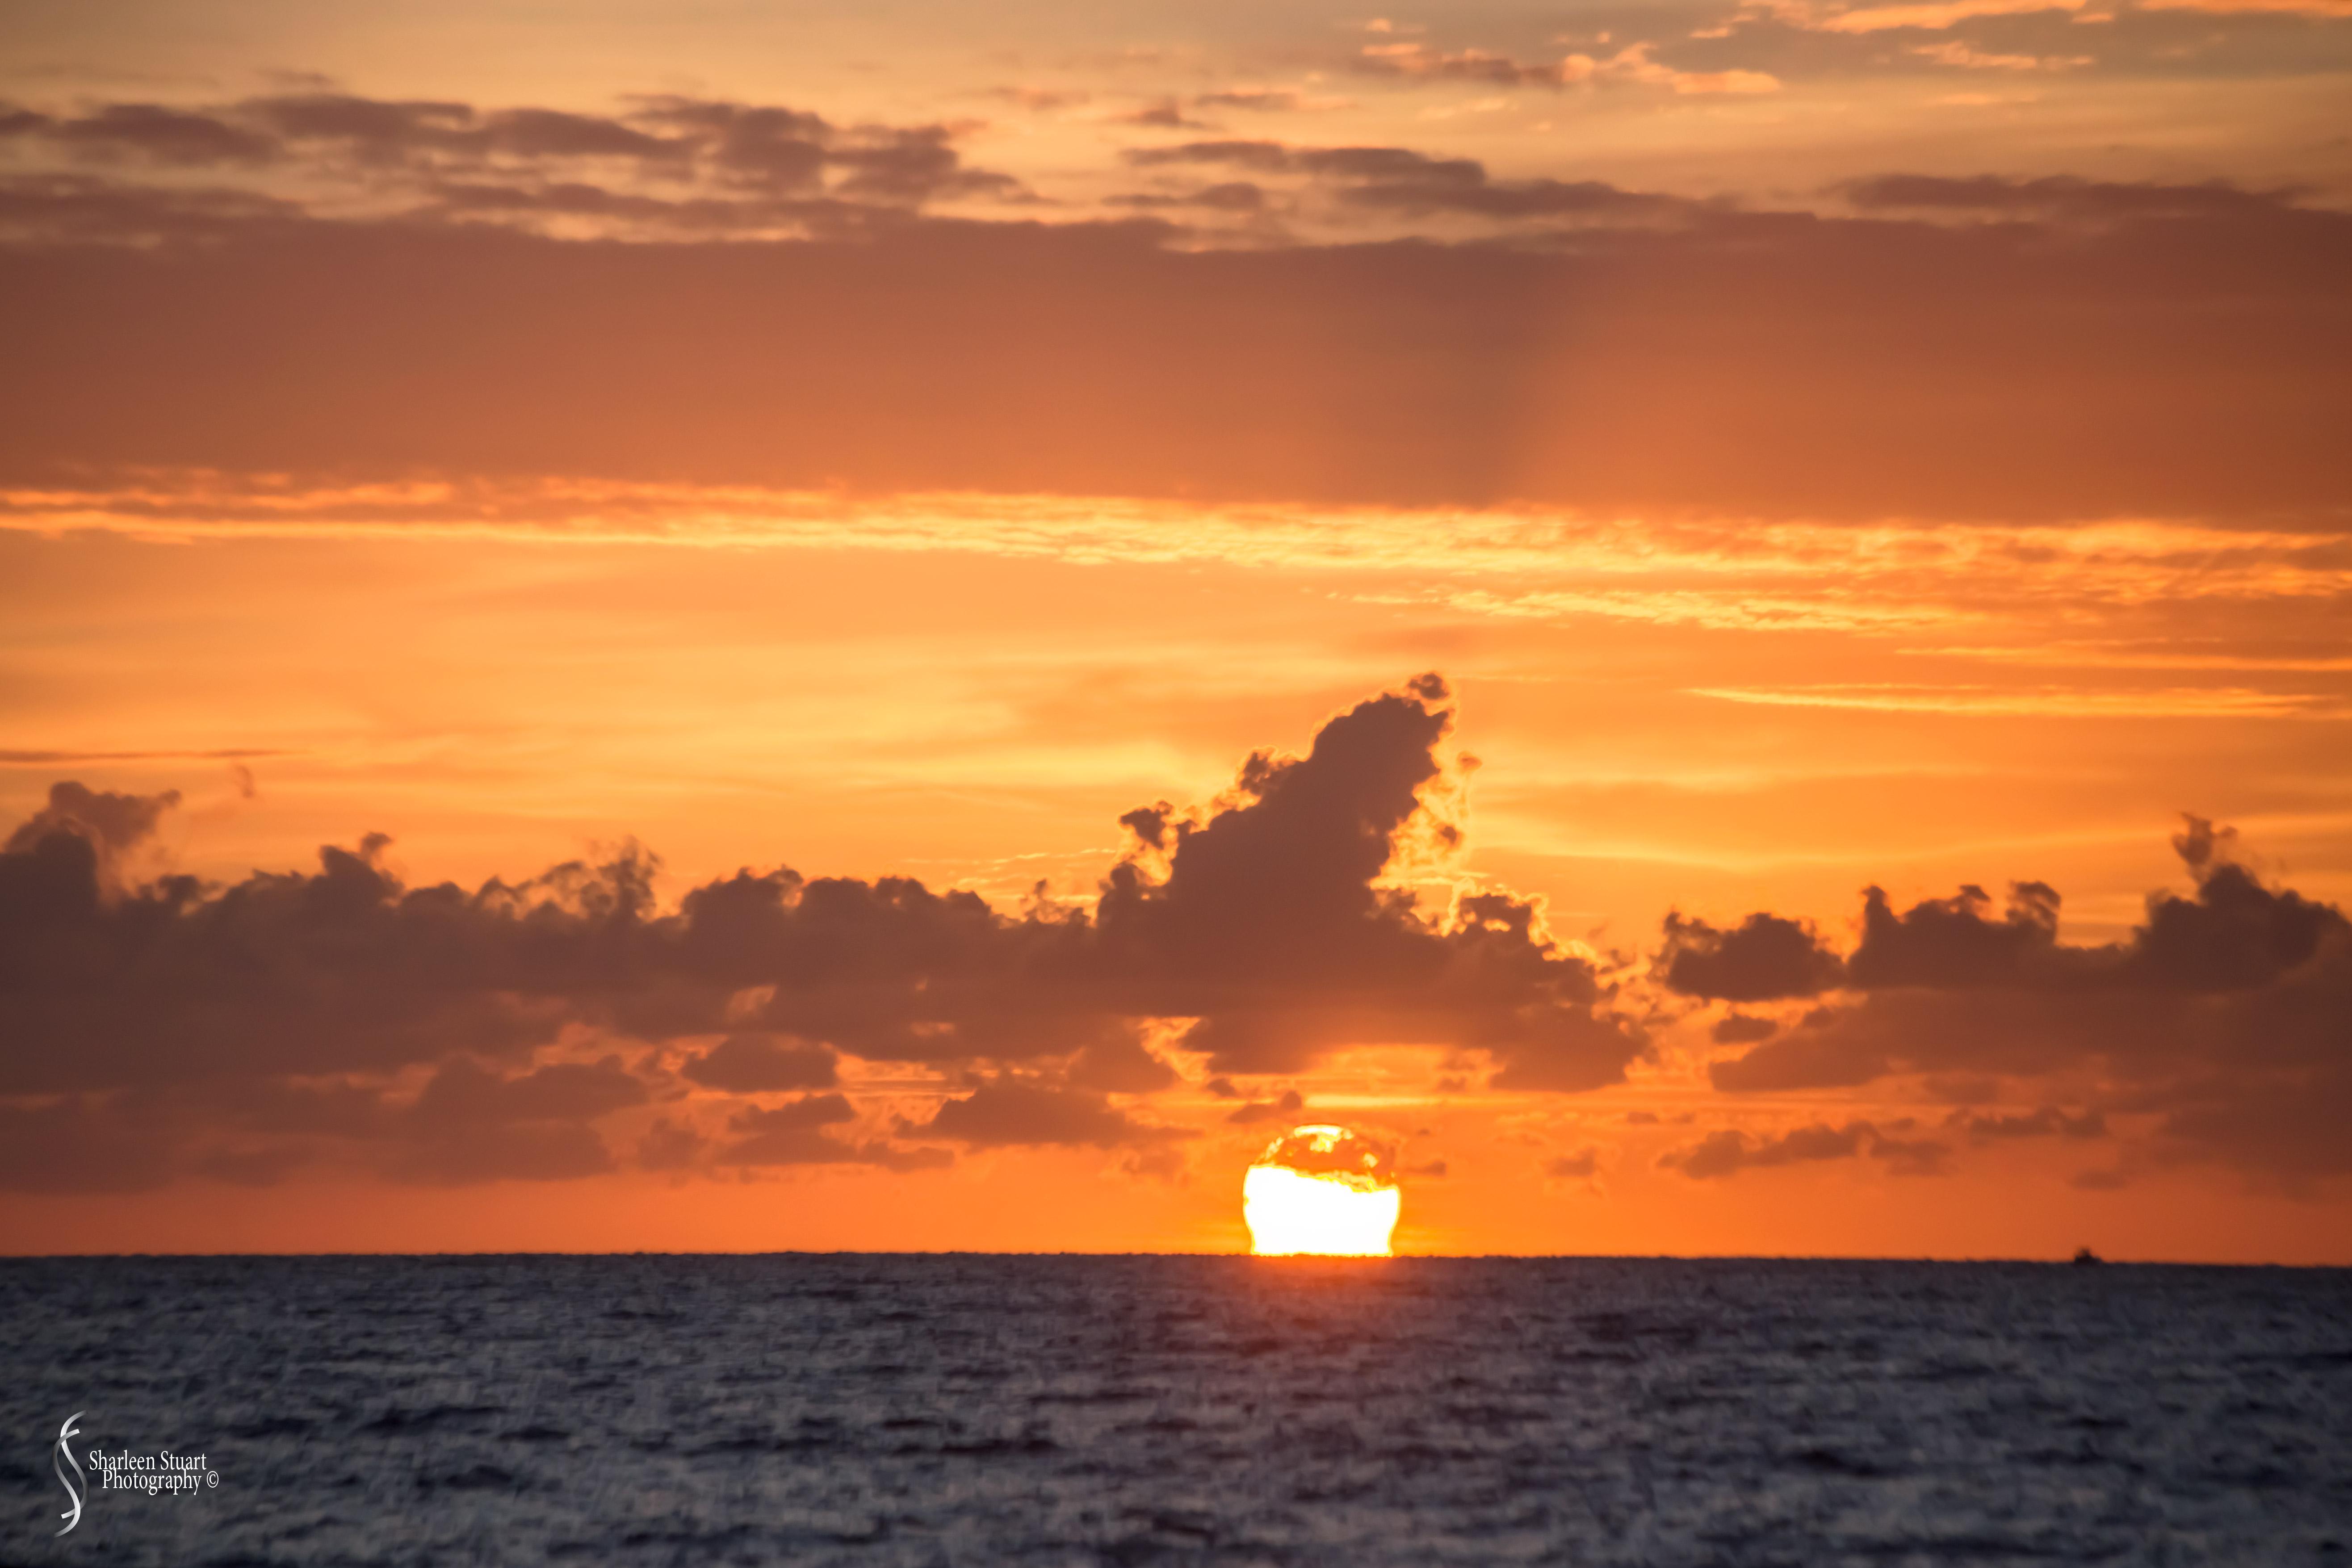 Deerfield Beach: Day before Hurricane Dorian: Nov 24, 2019: 8369